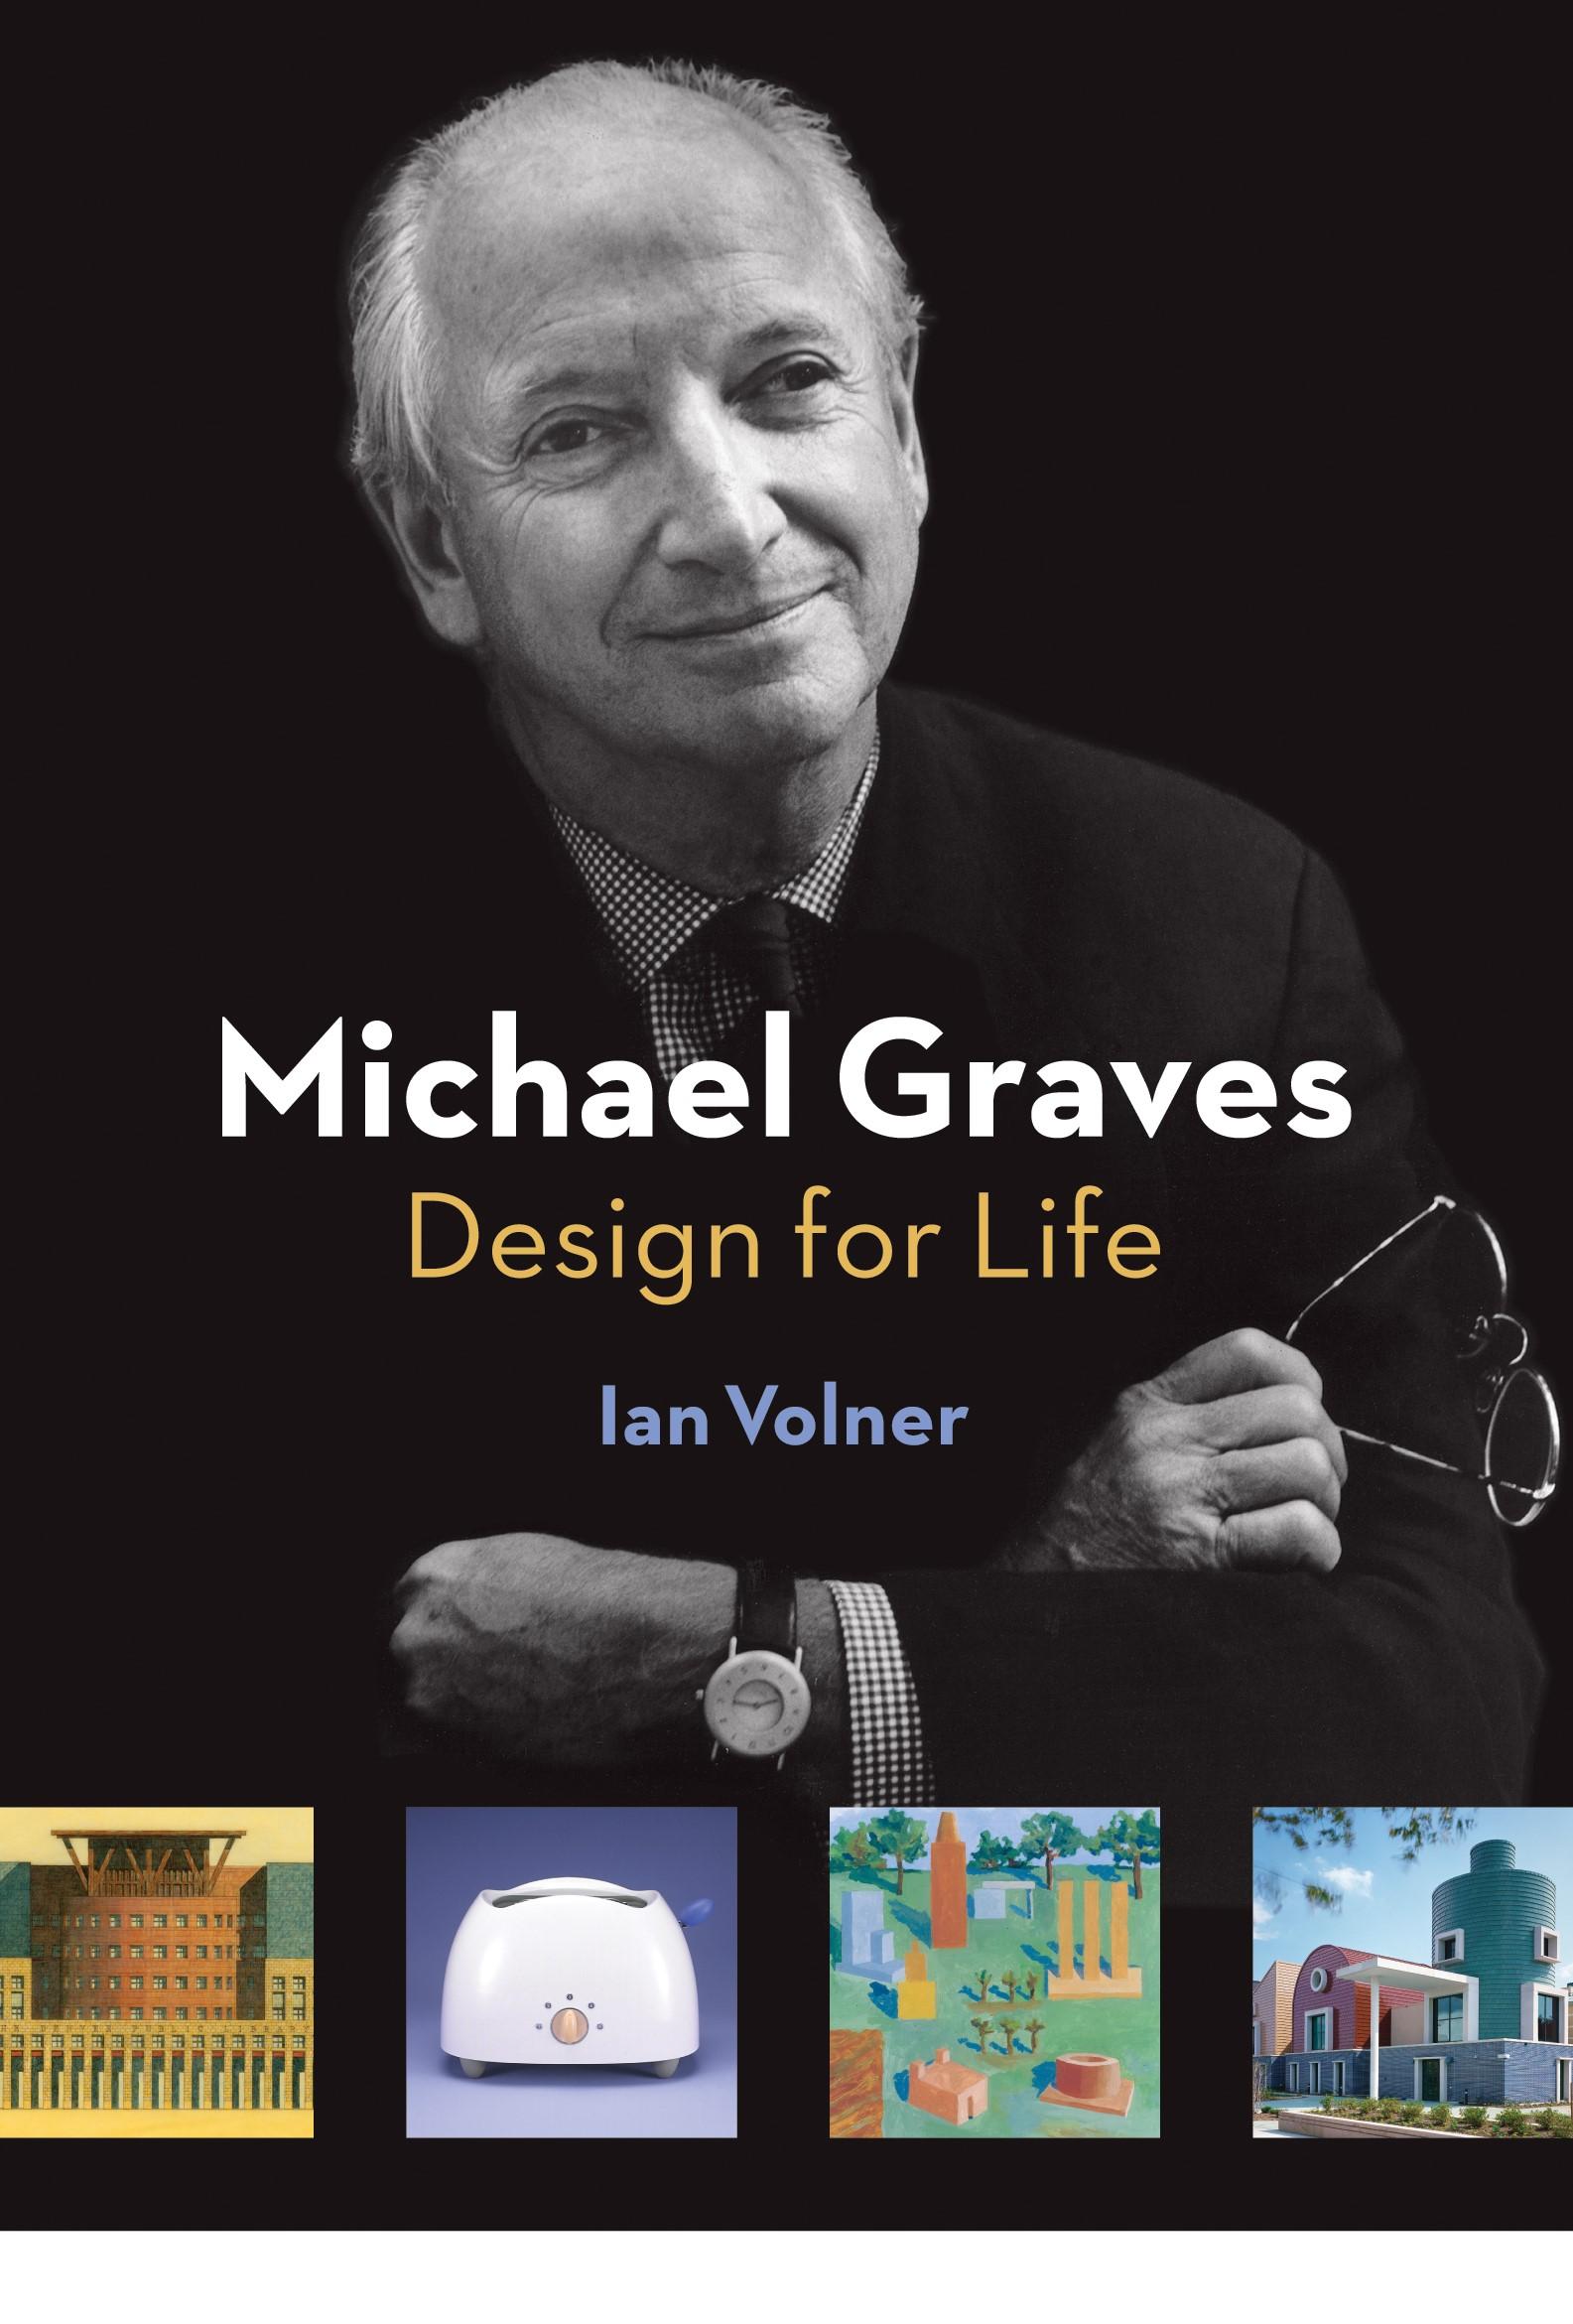 Michael Graves: Design for Life, Ian Volner